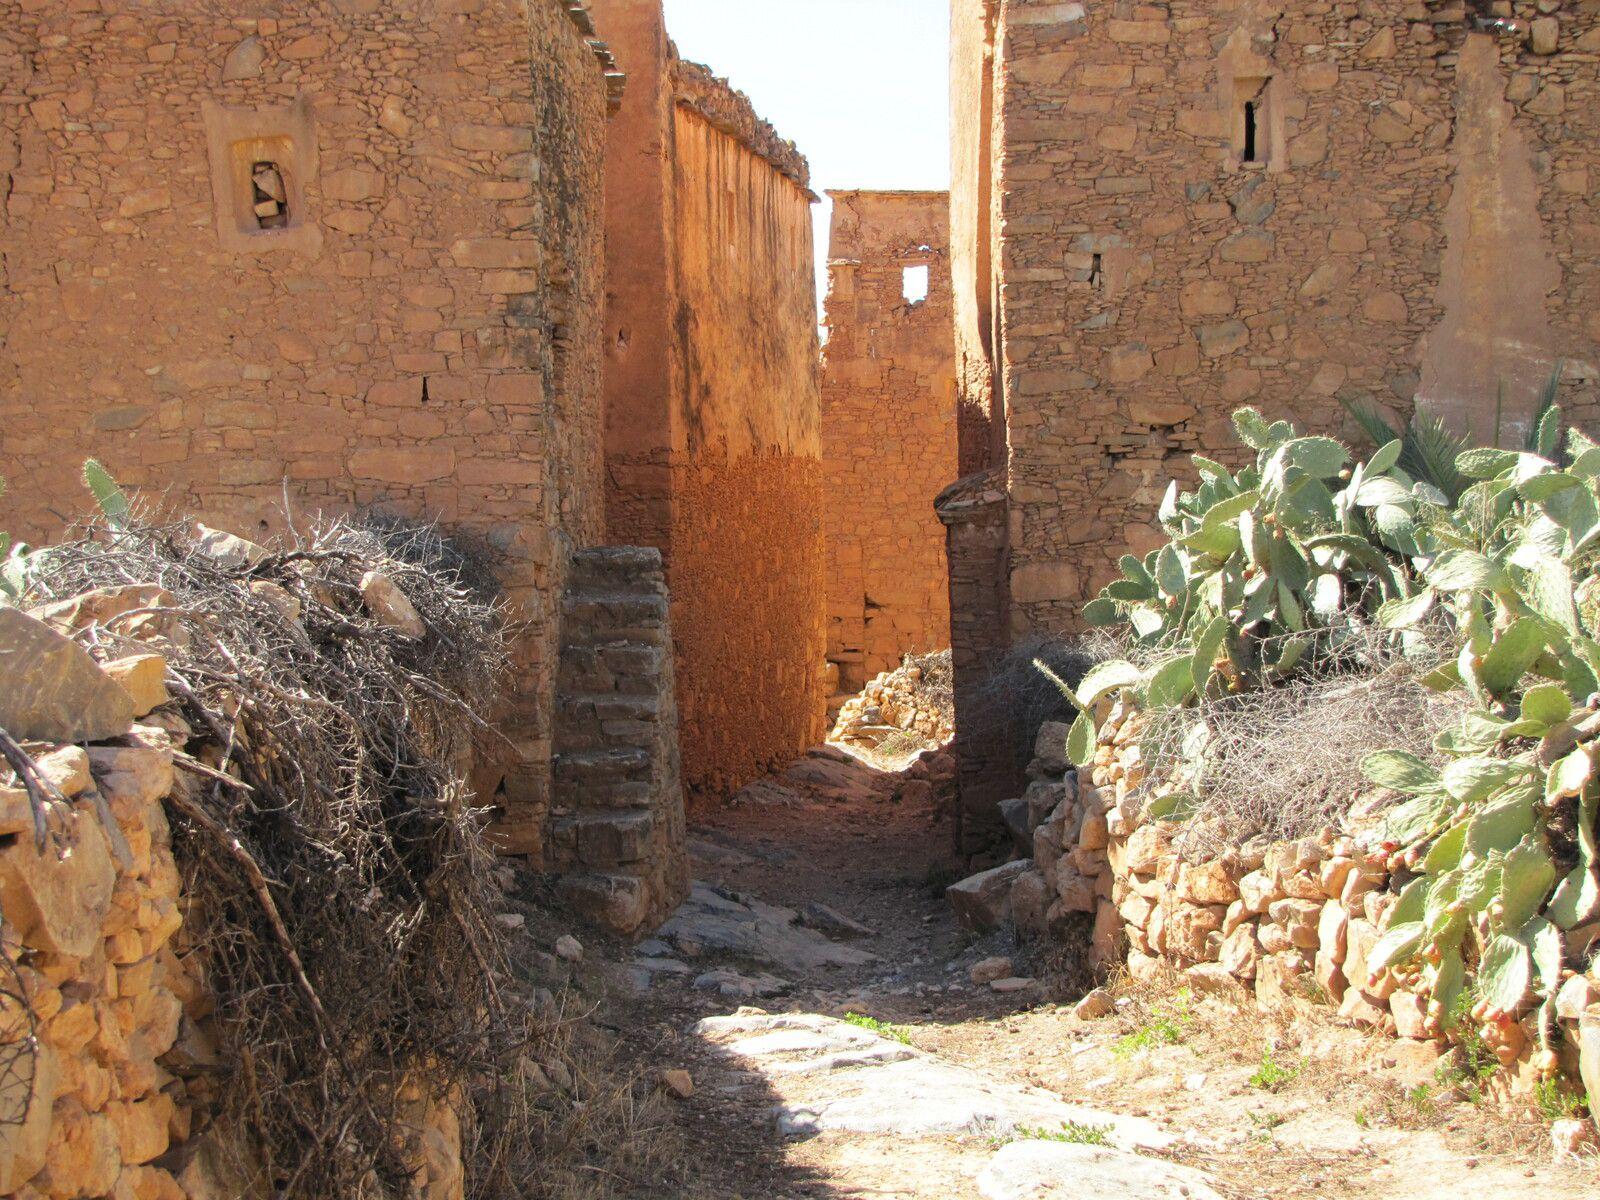 2016 - Maroc l'Agadir  d'Inoumar dans le souss Massa..